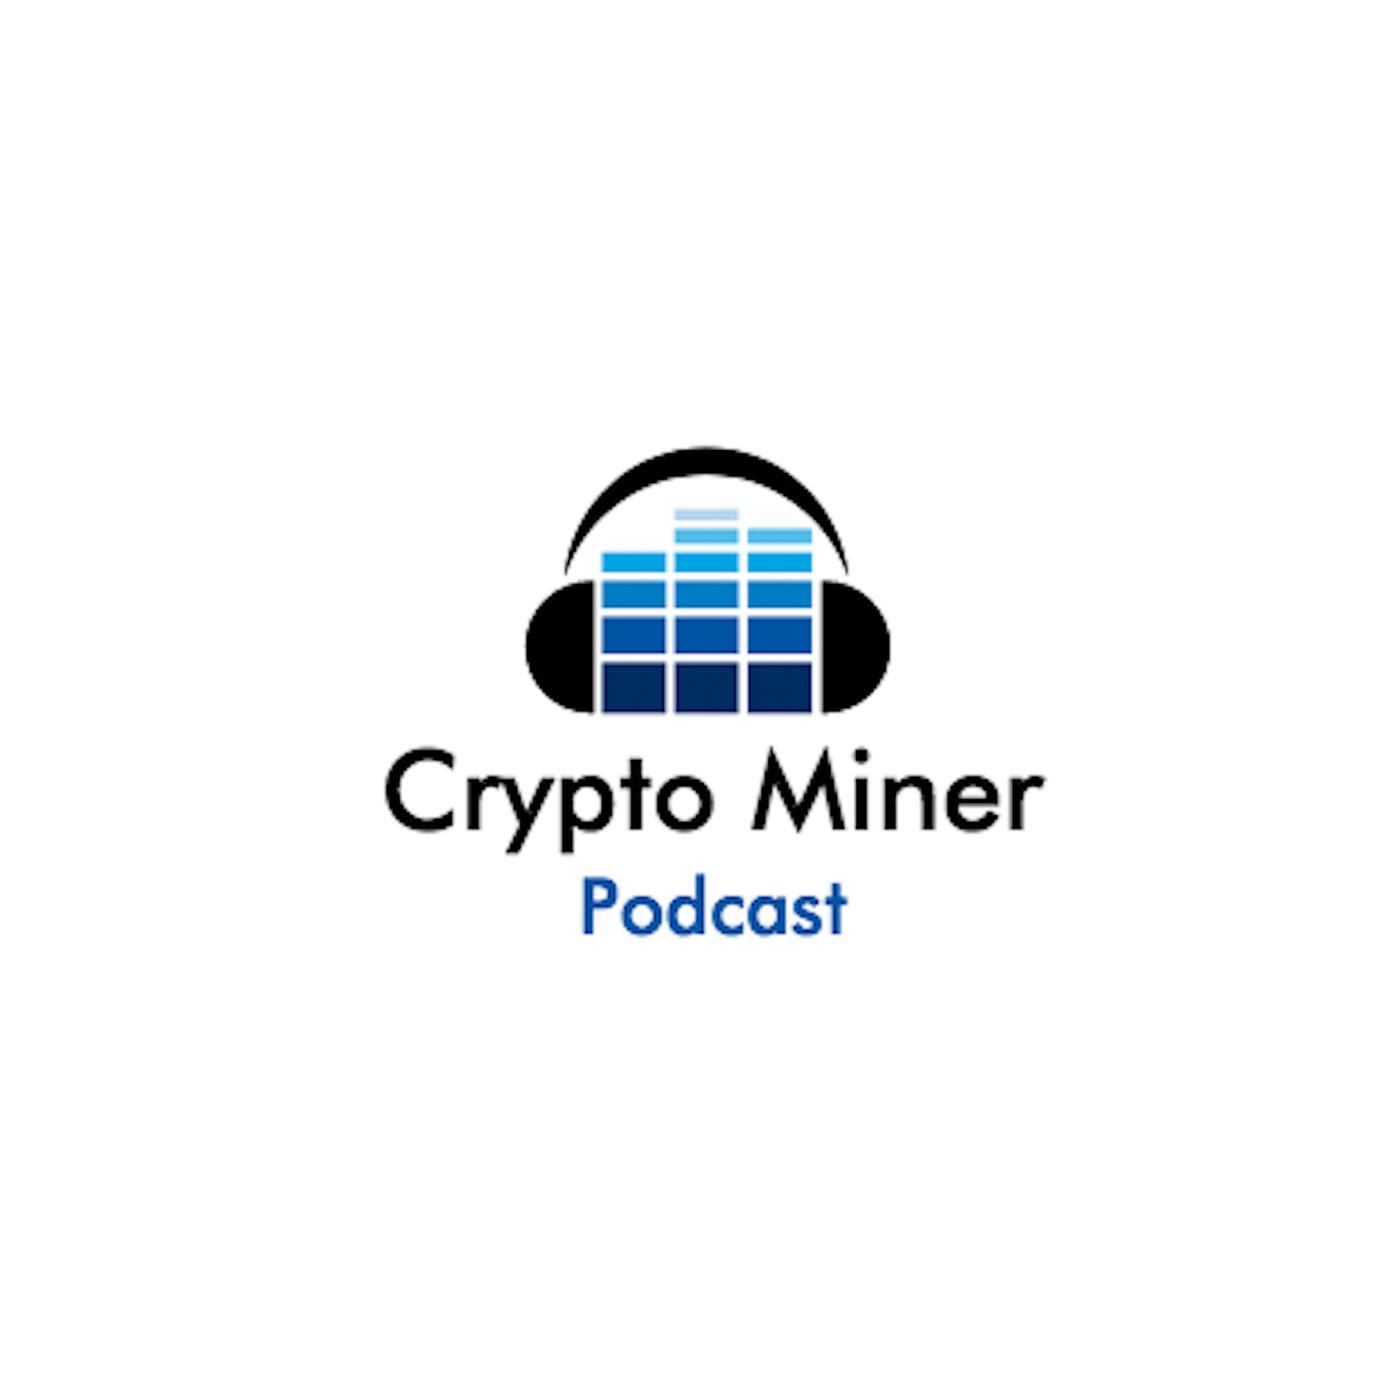 The Crypto Miner Podcast - The Crypto Miner Podcast   Listen